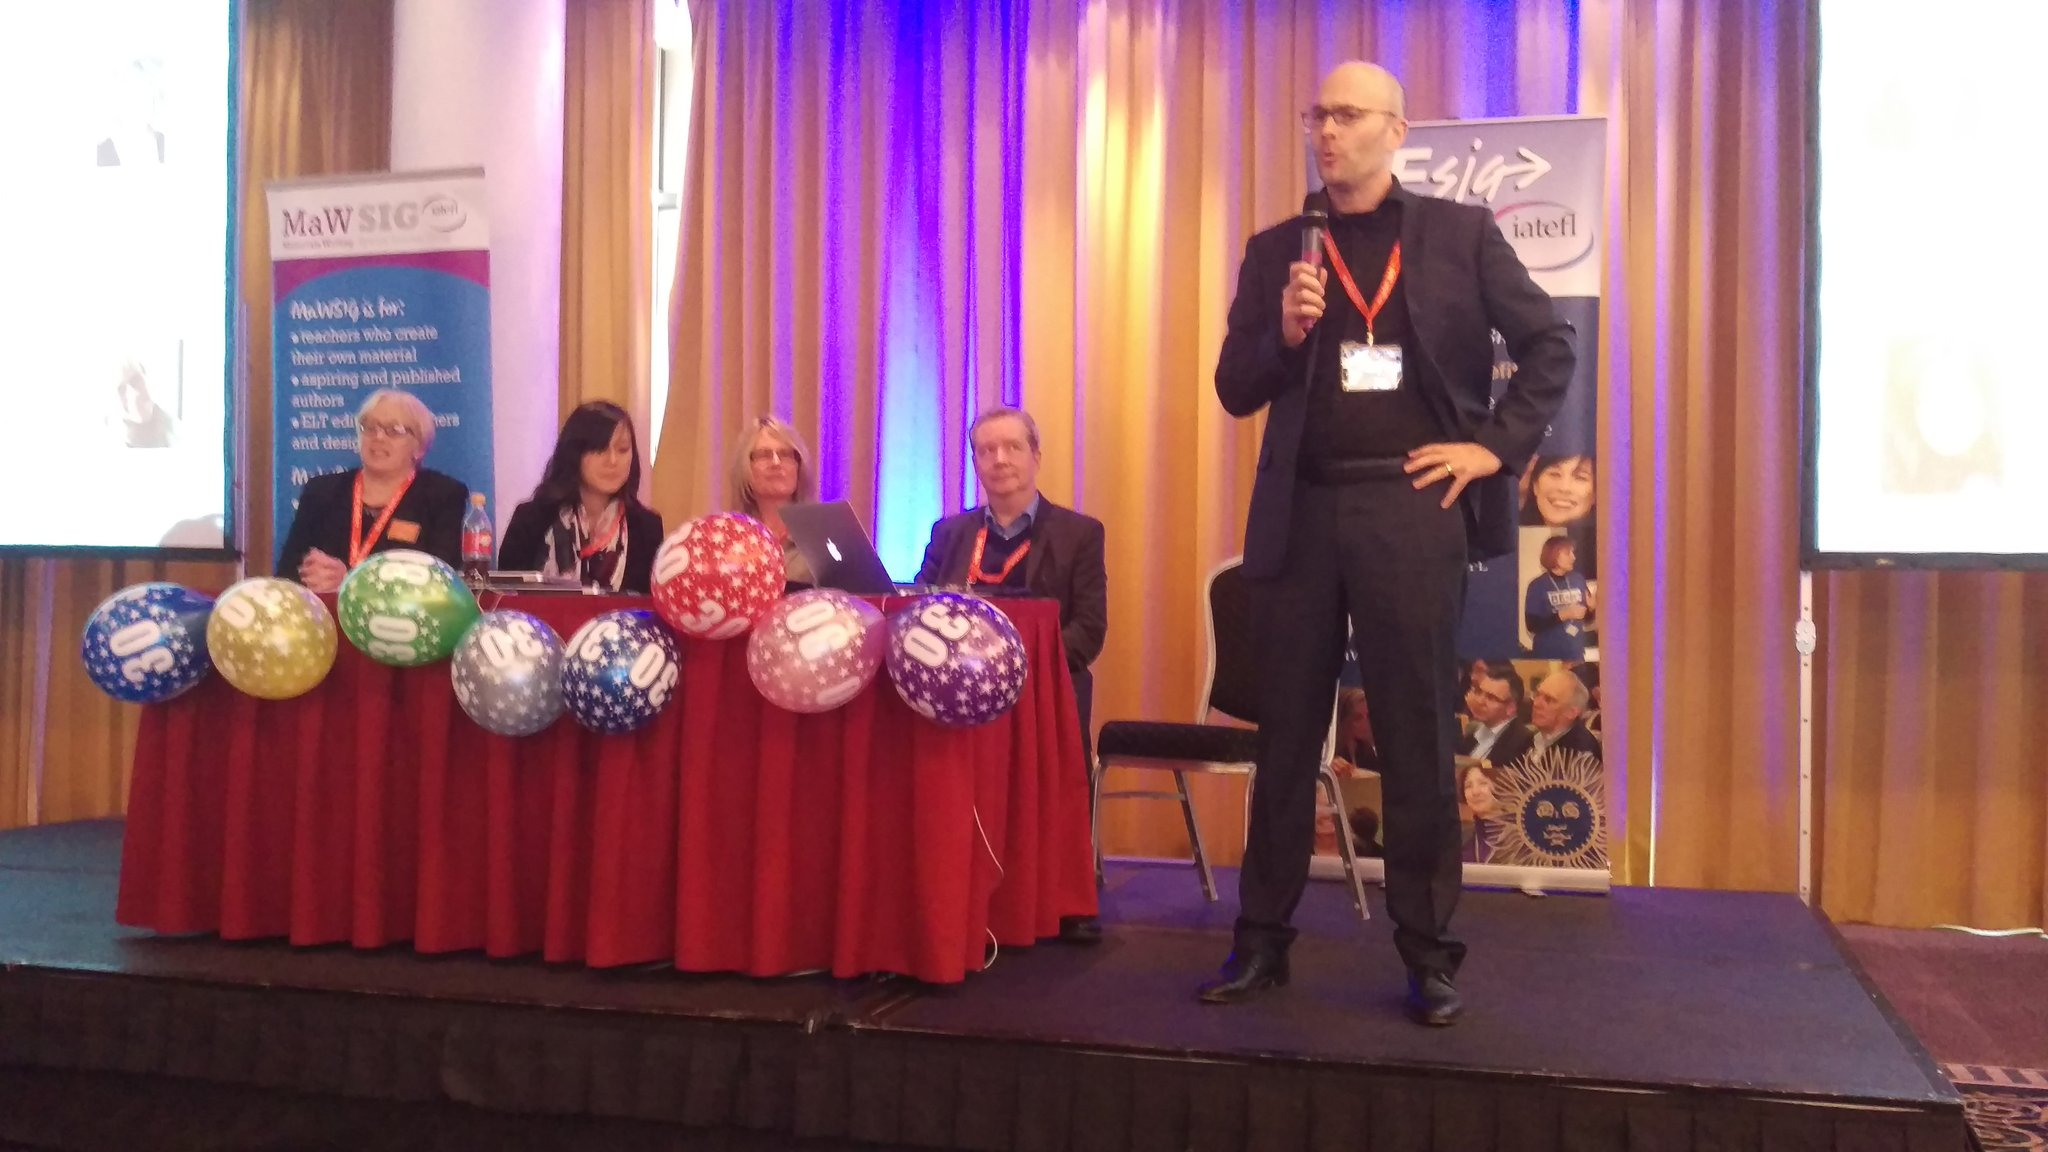 30th Anniversary of @iatefl_besig  Launching the Annual Conference in #Munich #IATEFL #BESIG #MAWSIG https://t.co/7NLWYFB8Fs